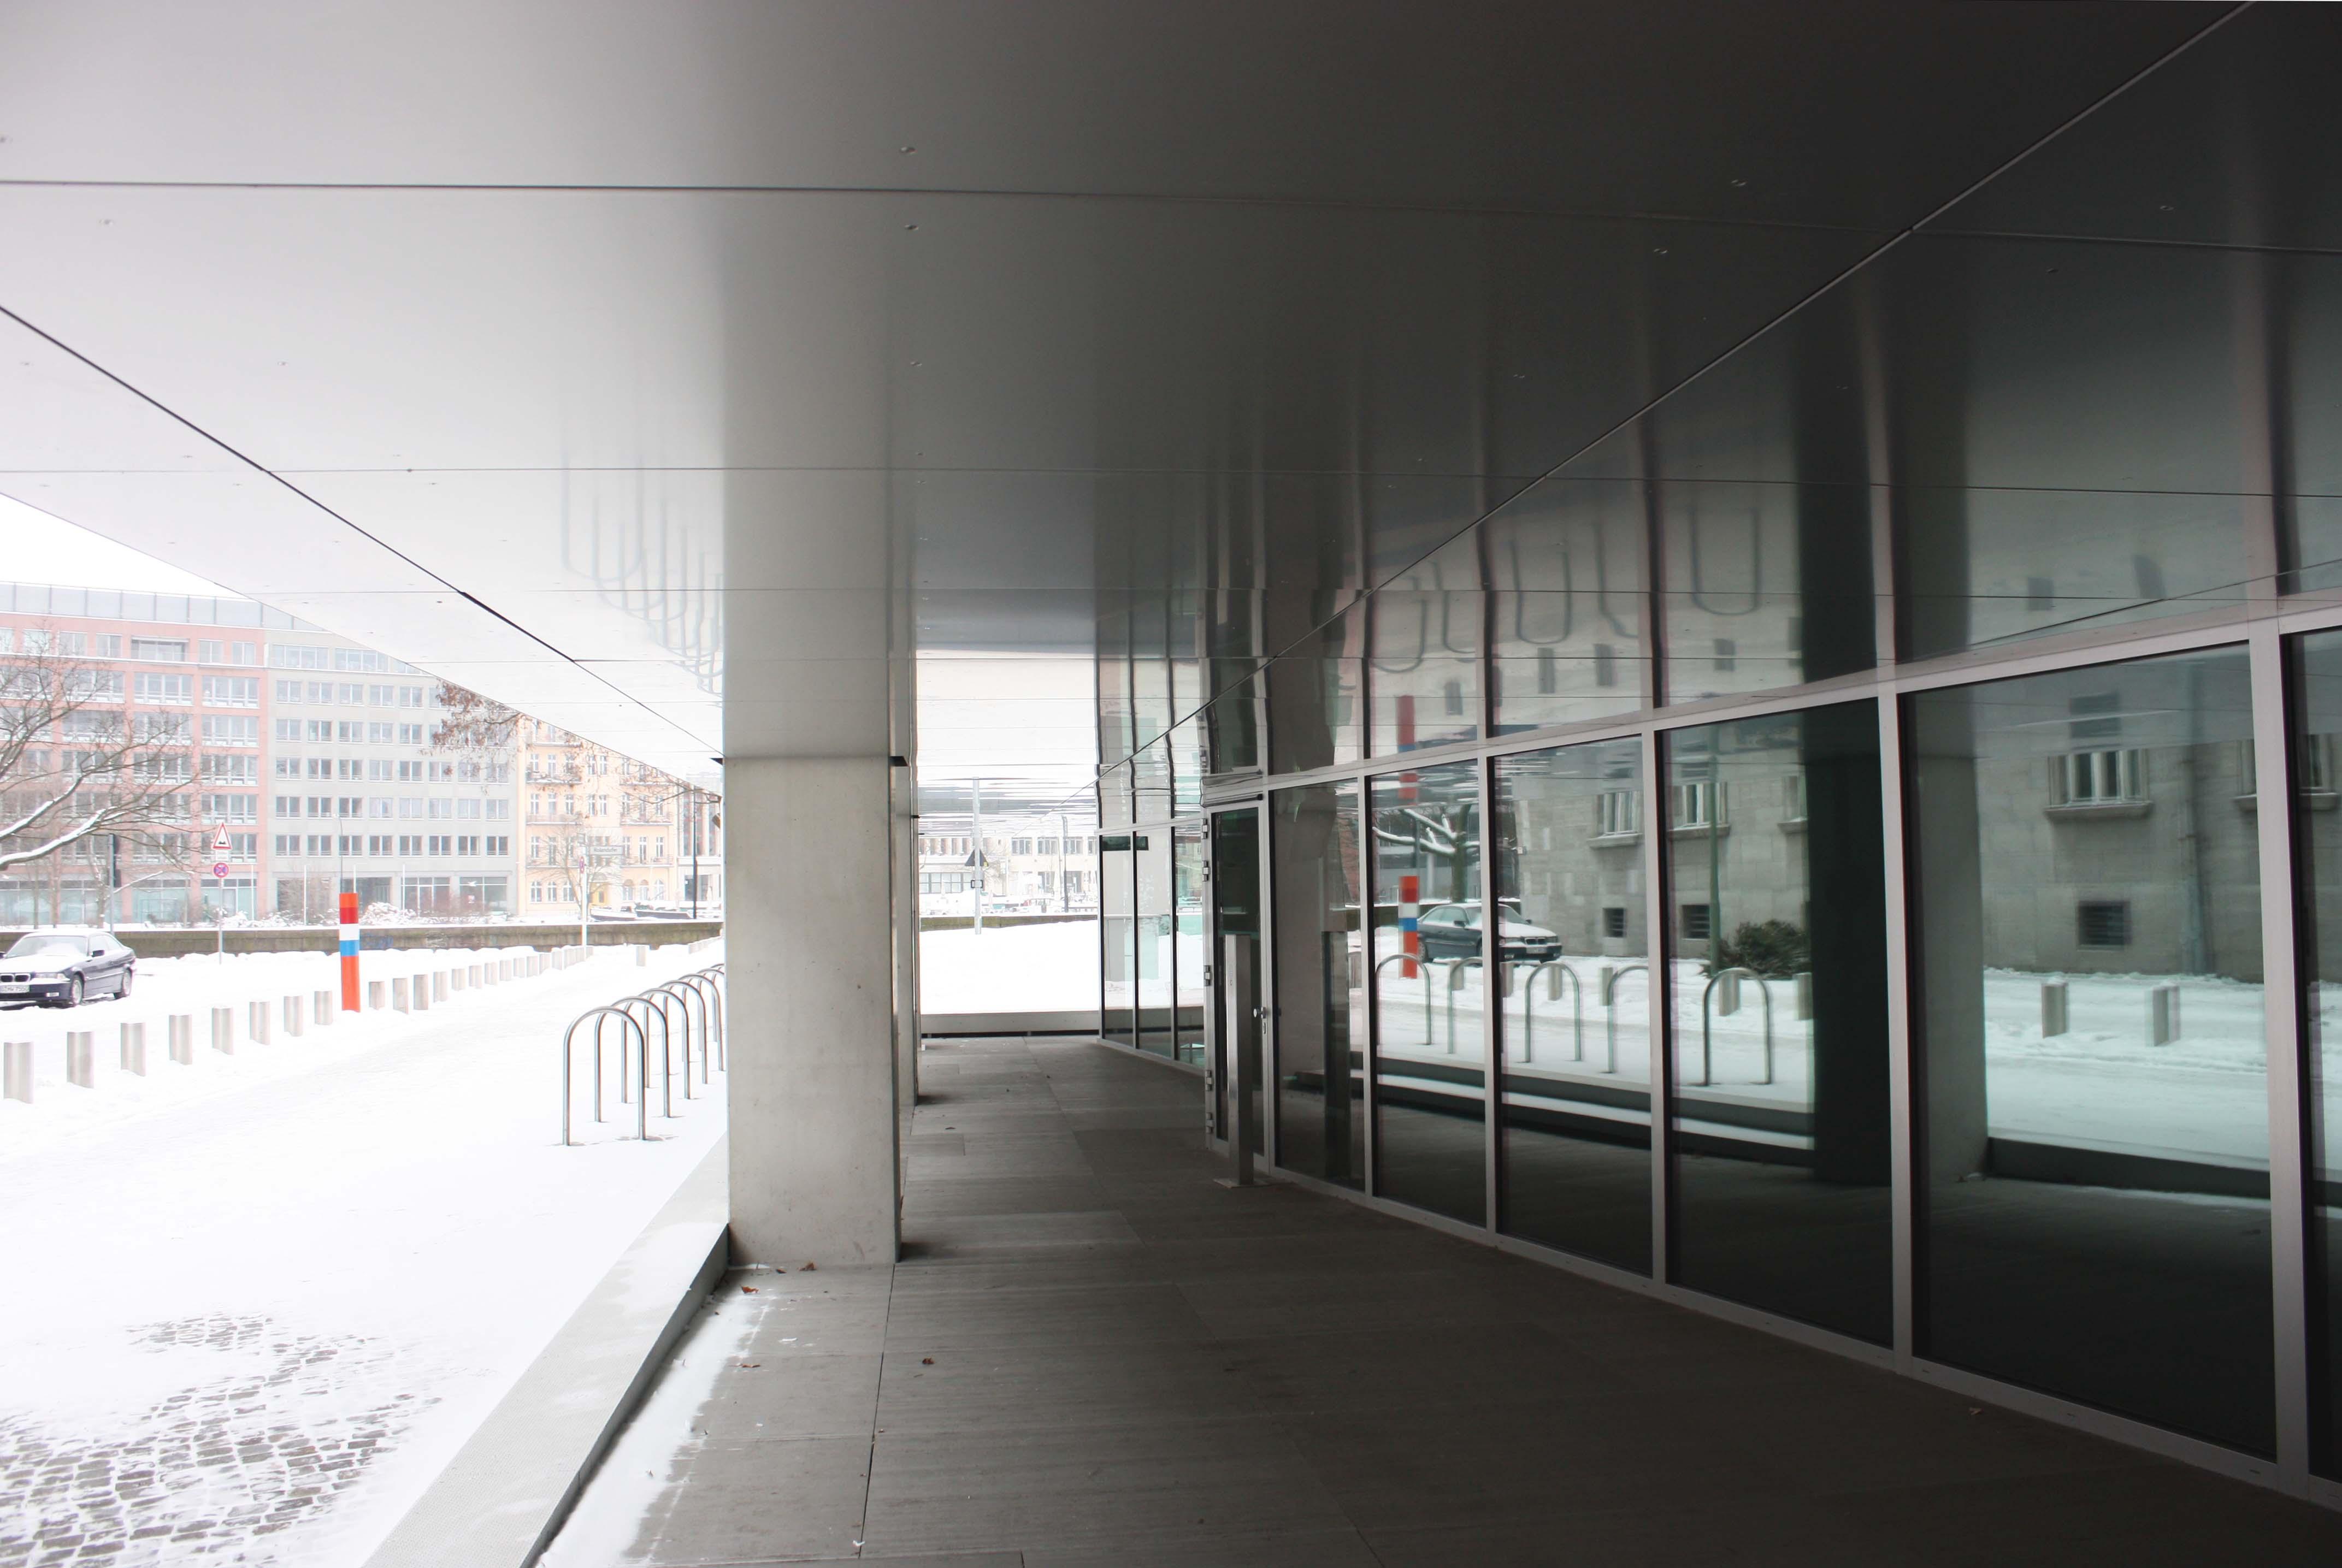 studio_stoel_architect_interieurarchitect_Kampen_zwolle_Nederlandse ambassade OMA